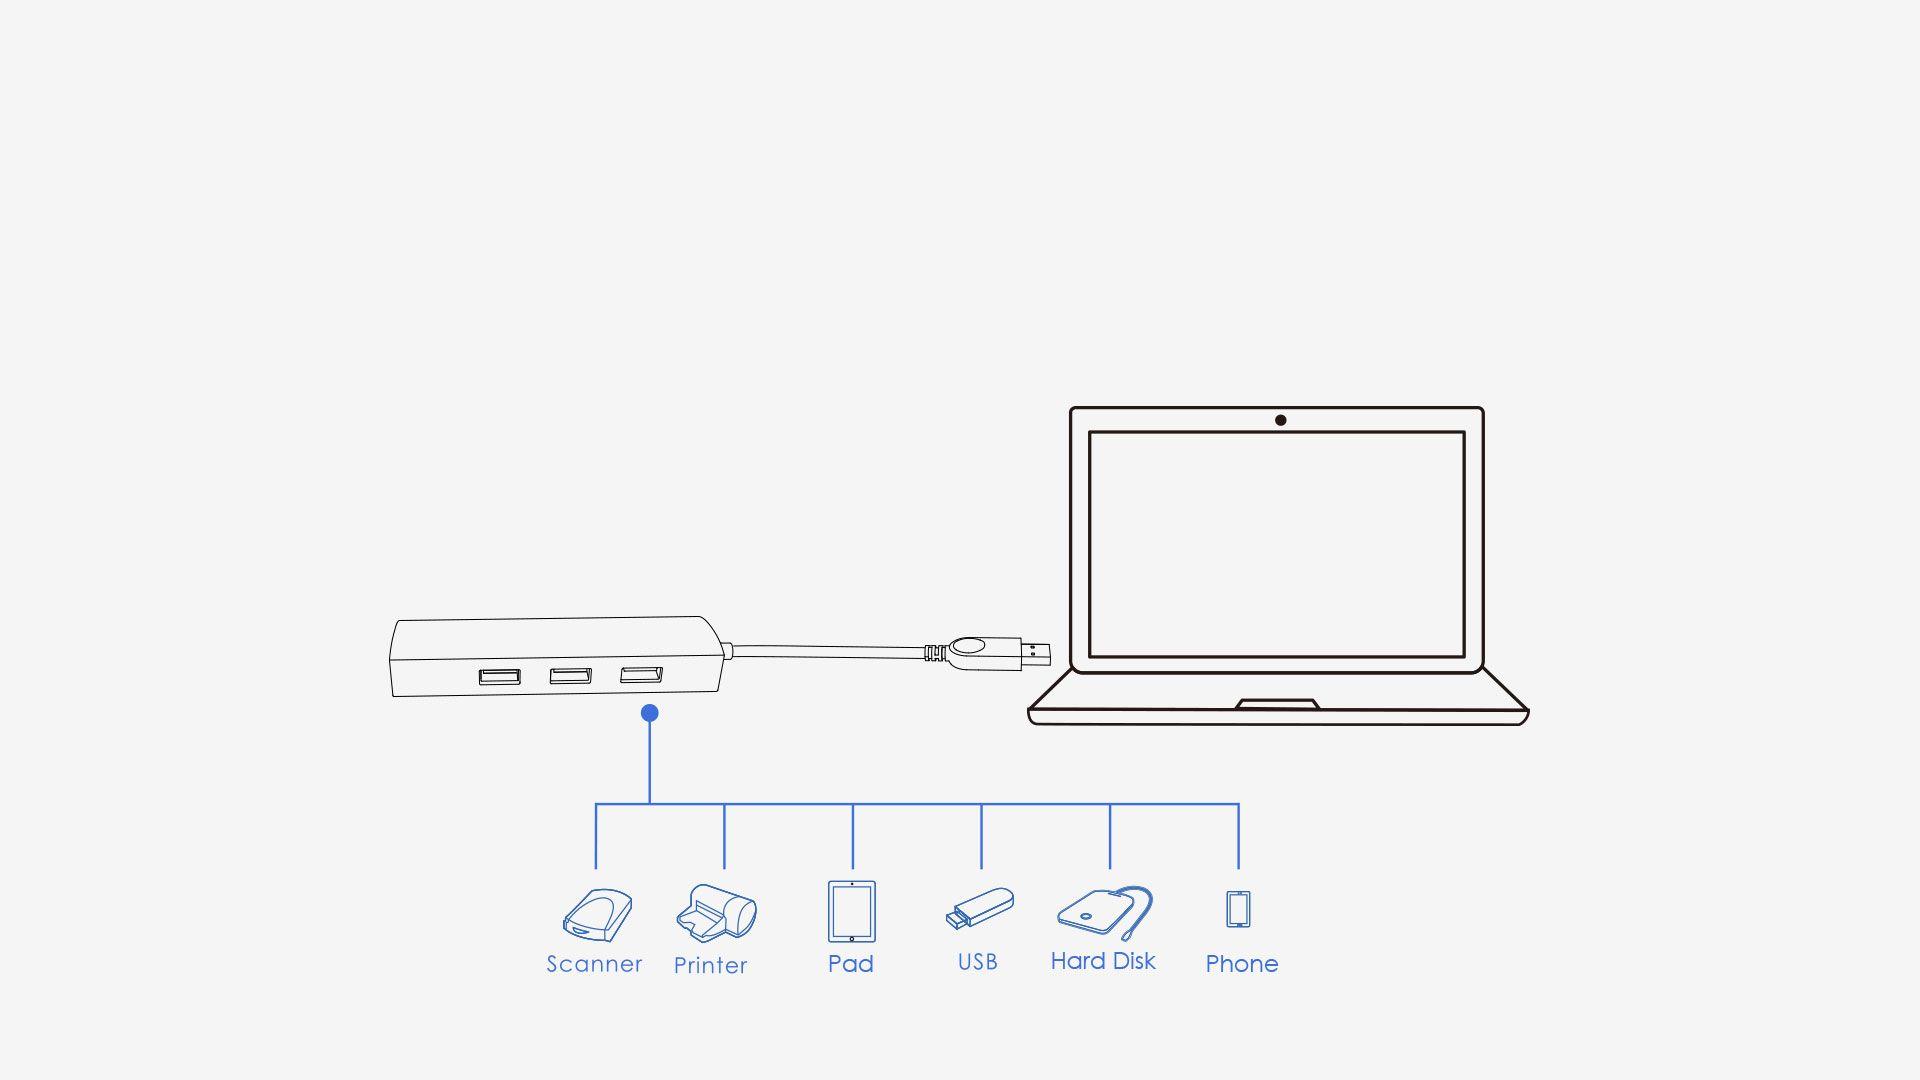 WAVLINK USB 3.0 4-PORT HUB WITH GIGABIT ETHERNET 5 8